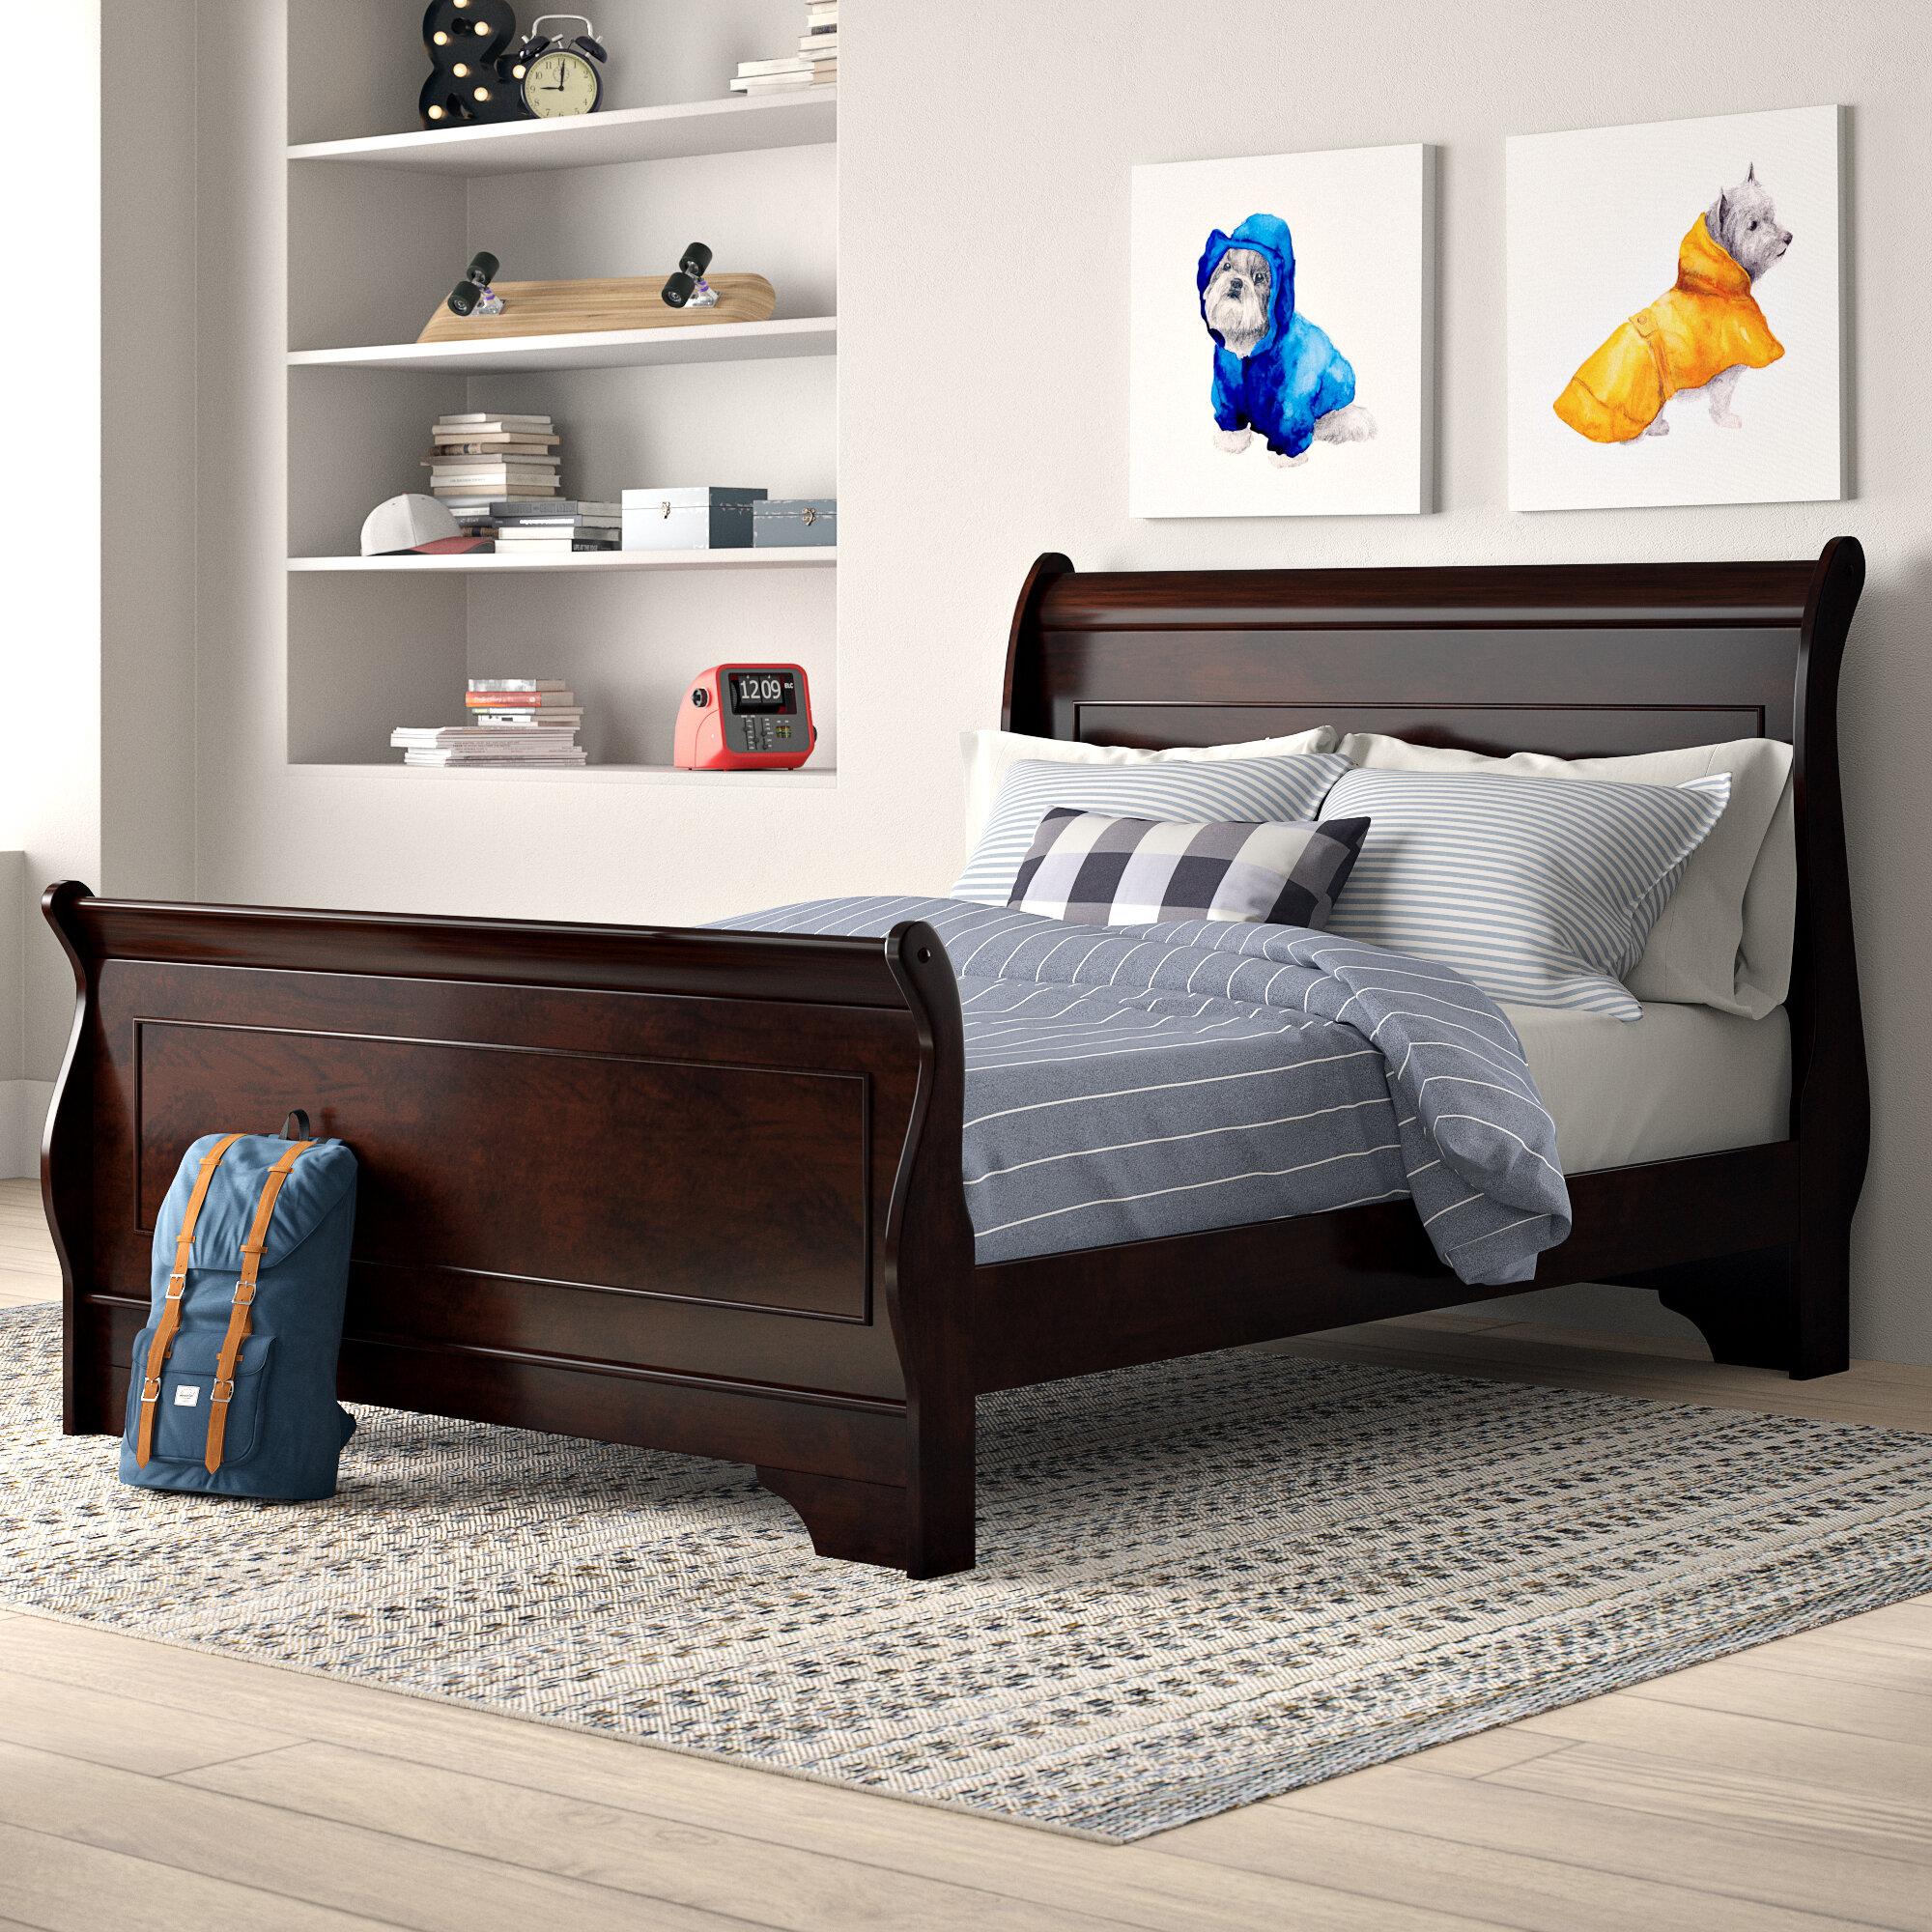 Alcott Hill Alivia Sleigh 4 Piece Configurable Bedroom Set Reviews Wayfair